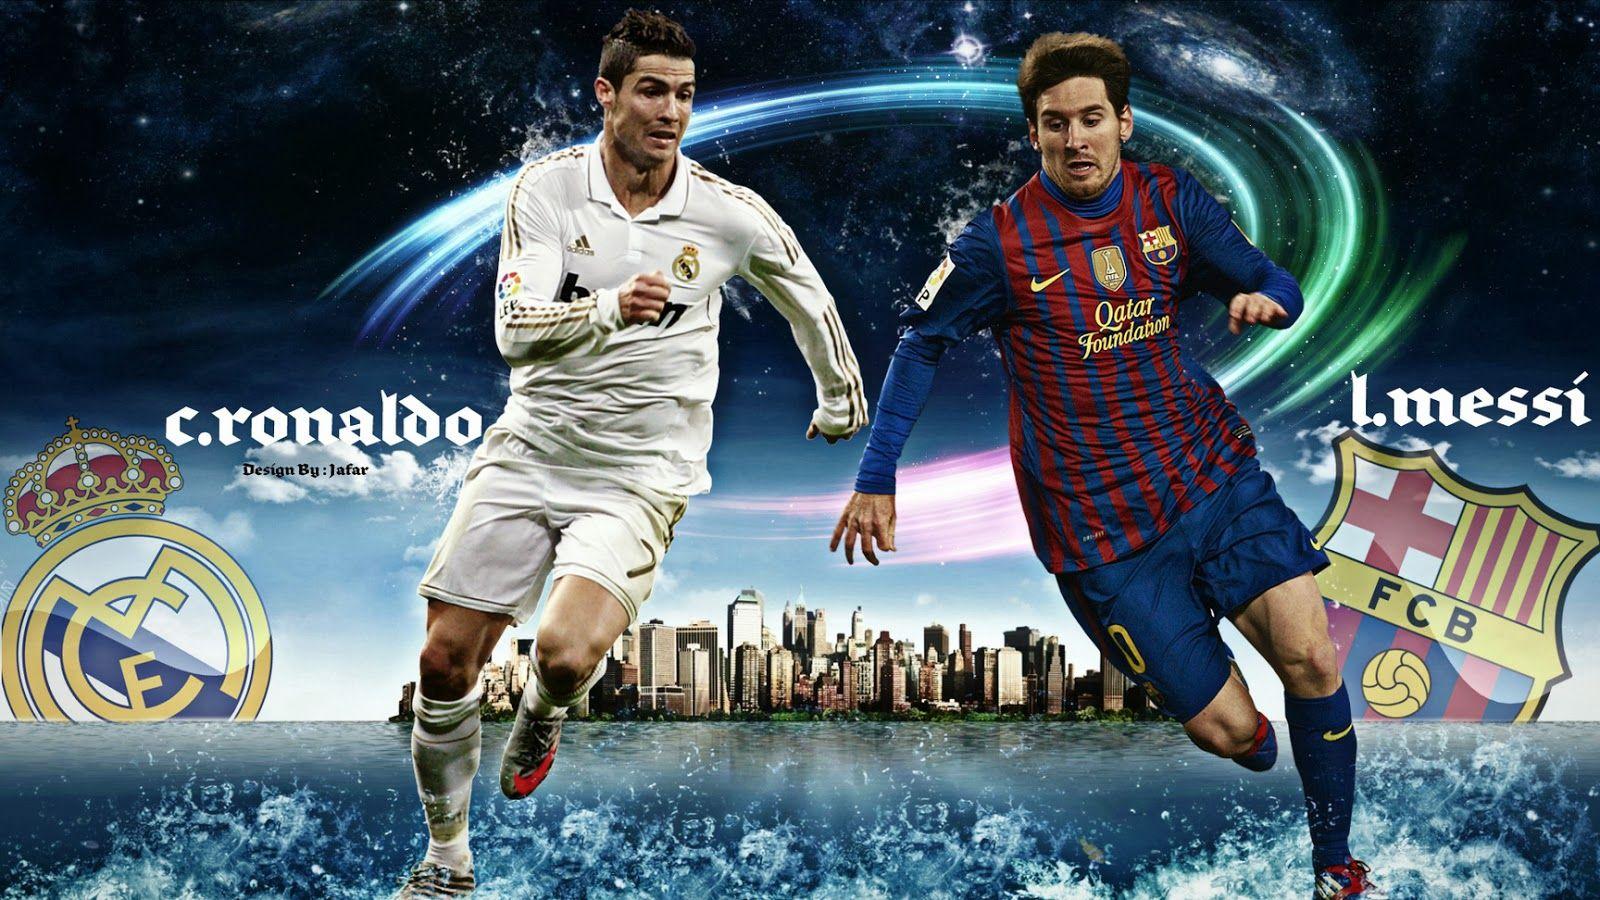 Messi Vs Ronaldo Google Search Messi Vs Ronaldo Ronaldo Messi Vs